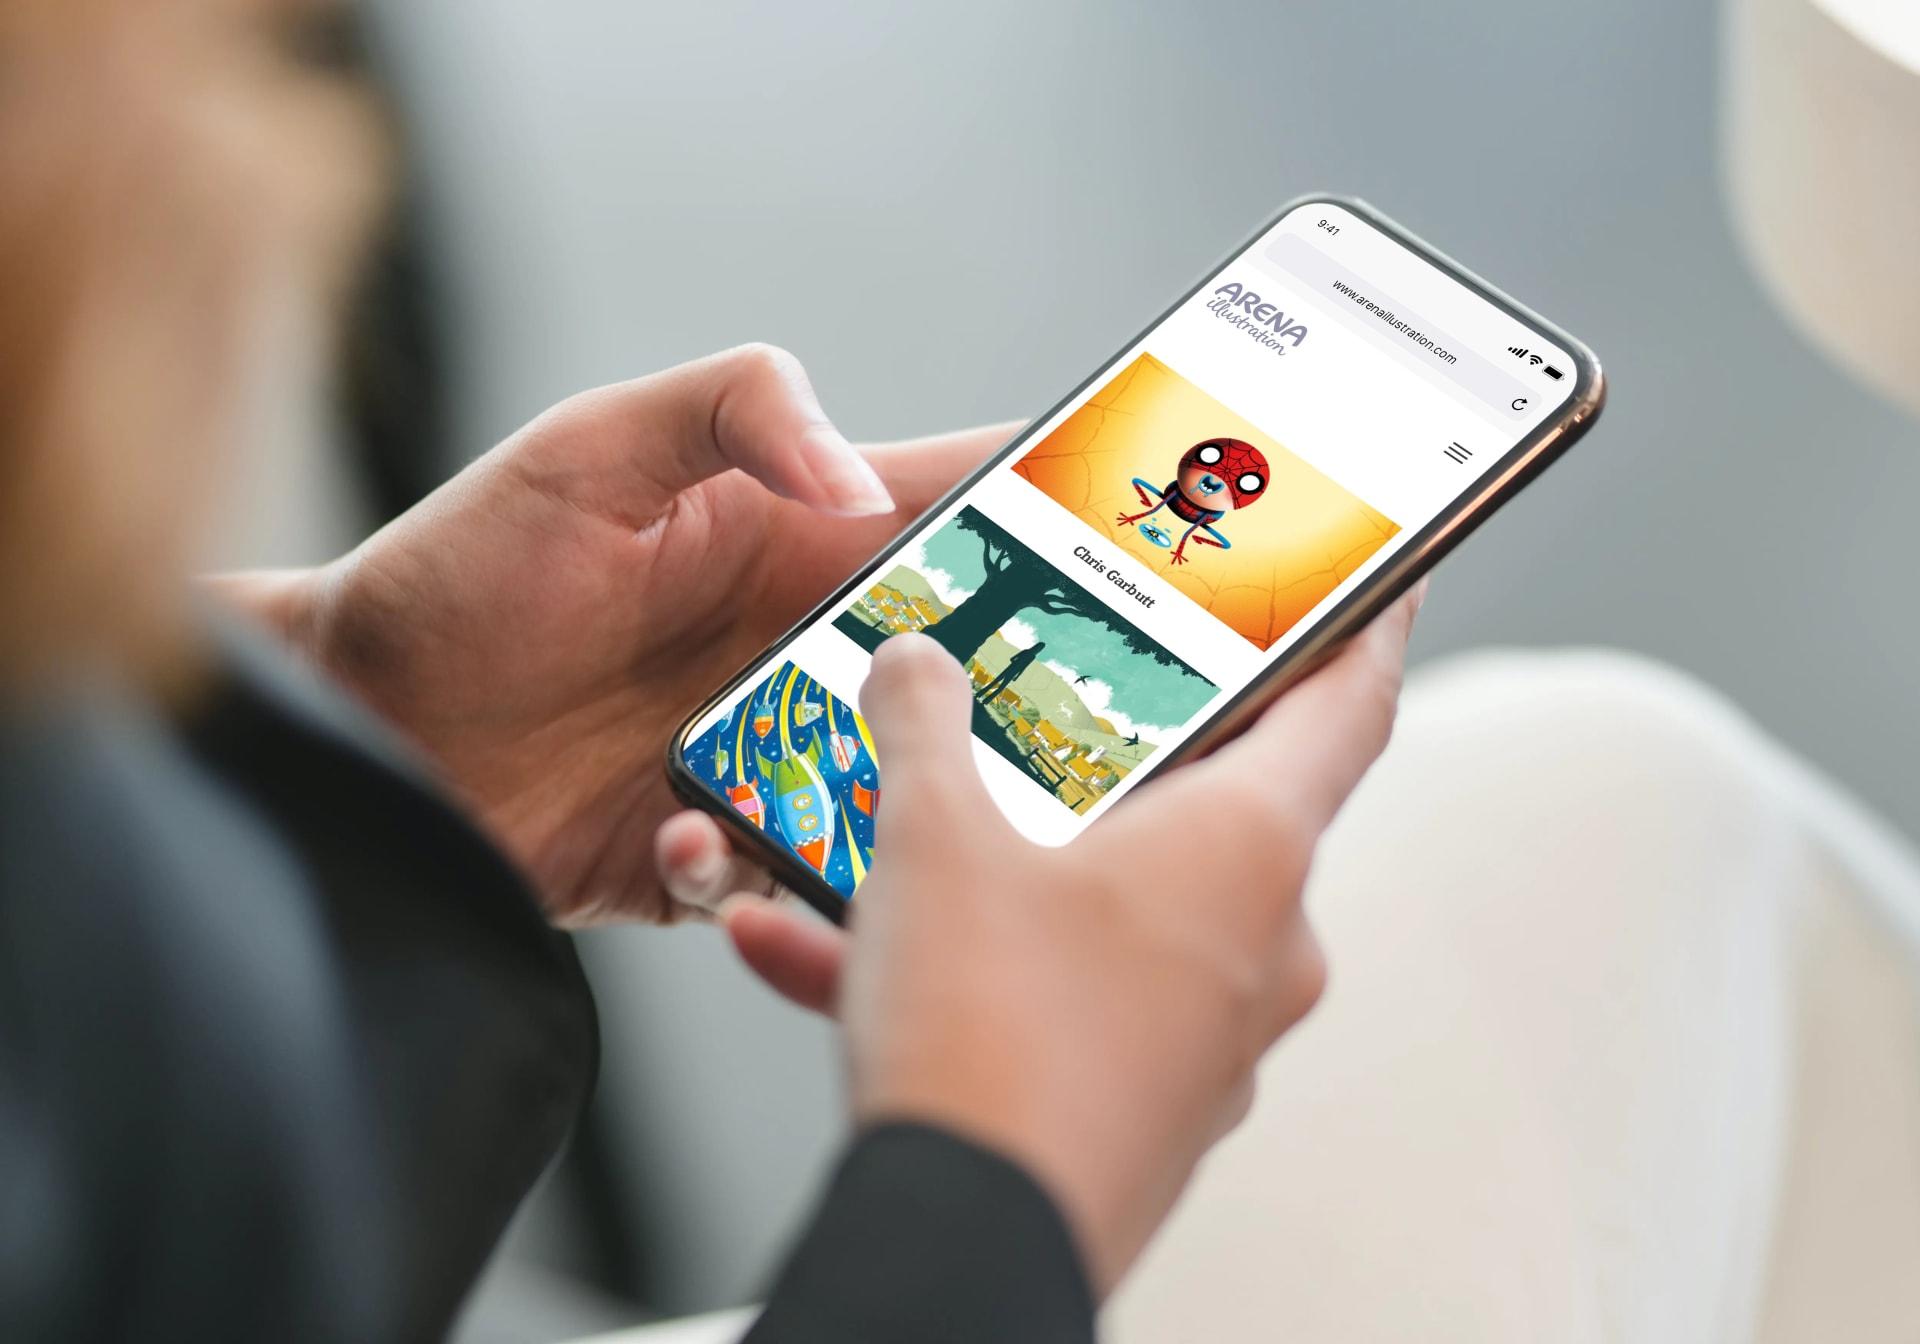 smartmockups kjvmqojg n9iq21